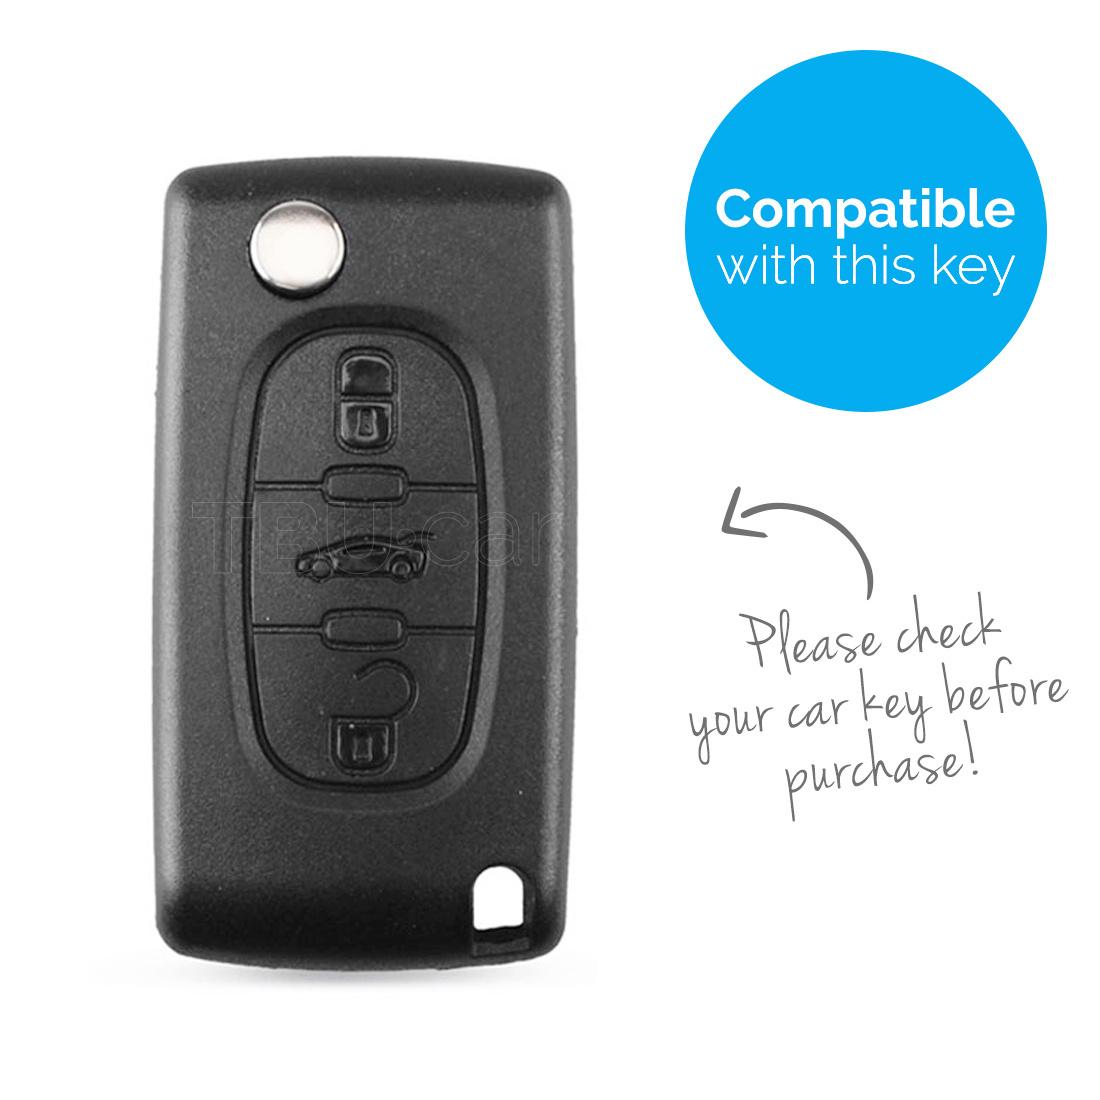 TBU car TBU car Sleutel cover compatibel met Peugeot - Silicone sleutelhoesje - beschermhoesje autosleutel - Rood